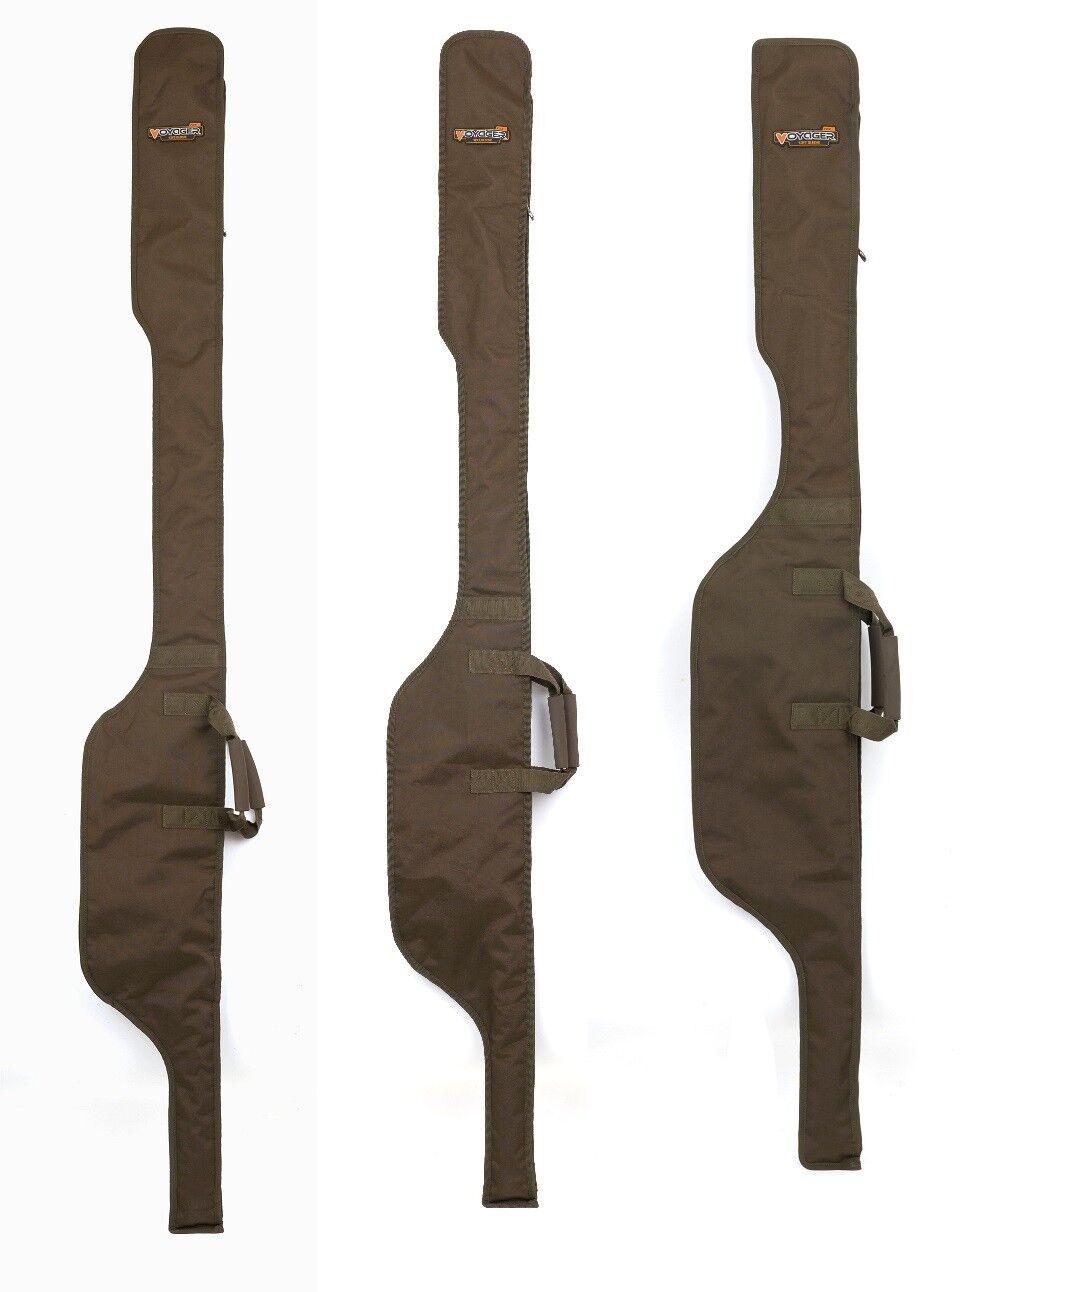 Fox Voyager Single Rod Sleeve Rutentasche Rutenfutteral Futteral Einzelfutteral